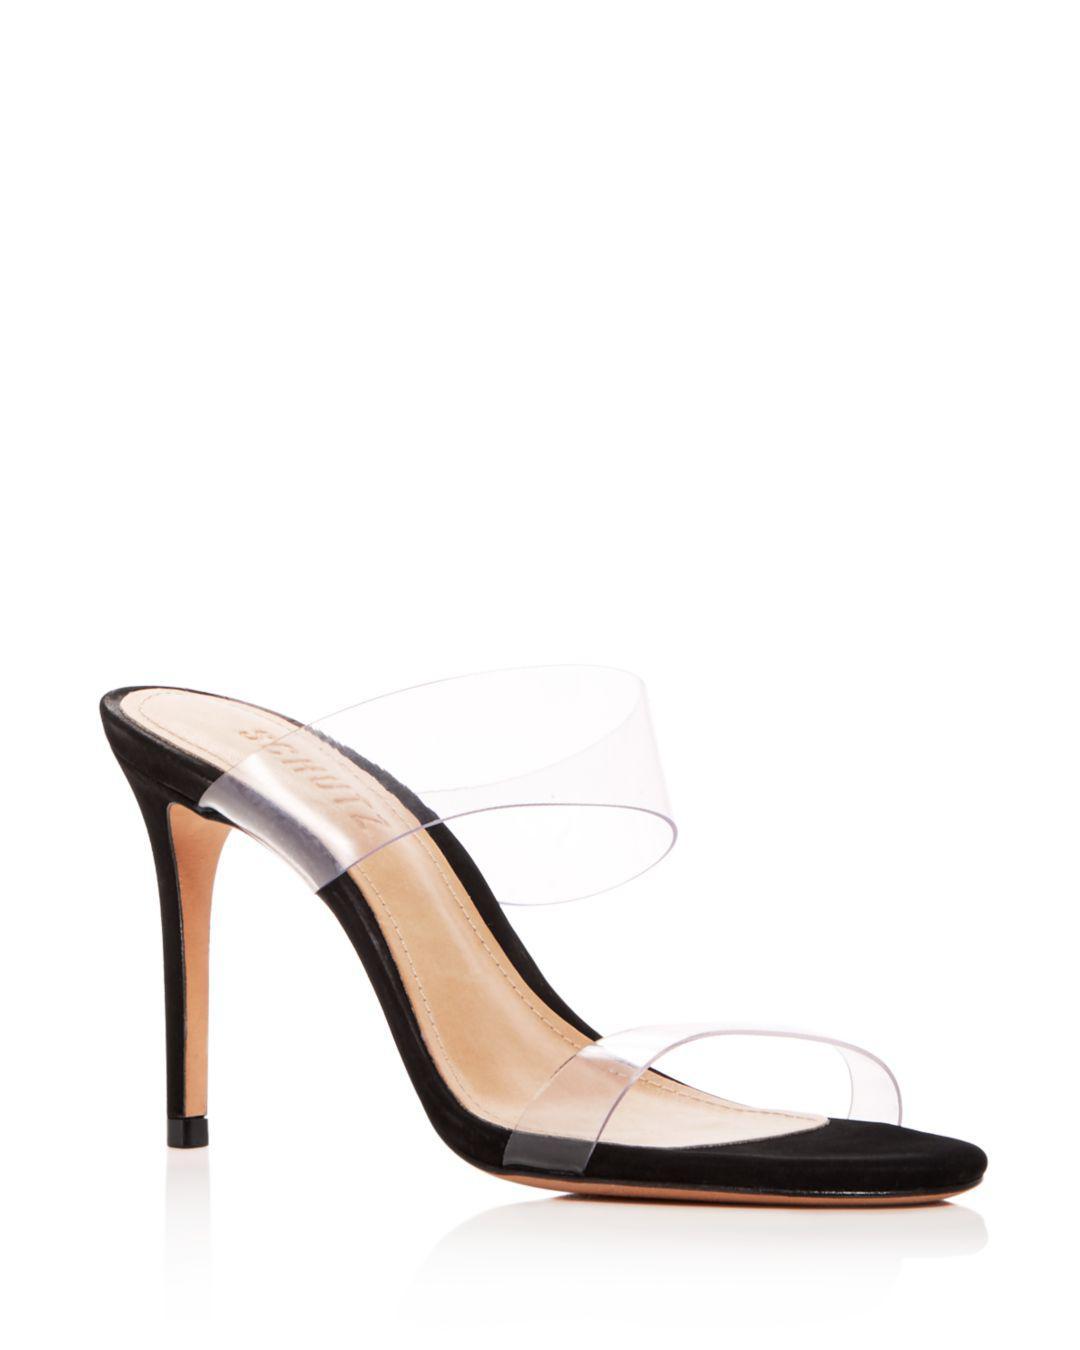 6672122df Schutz - Black Women s Ariella Clear Strap High-heel Slide Sandals - Lyst.  View fullscreen